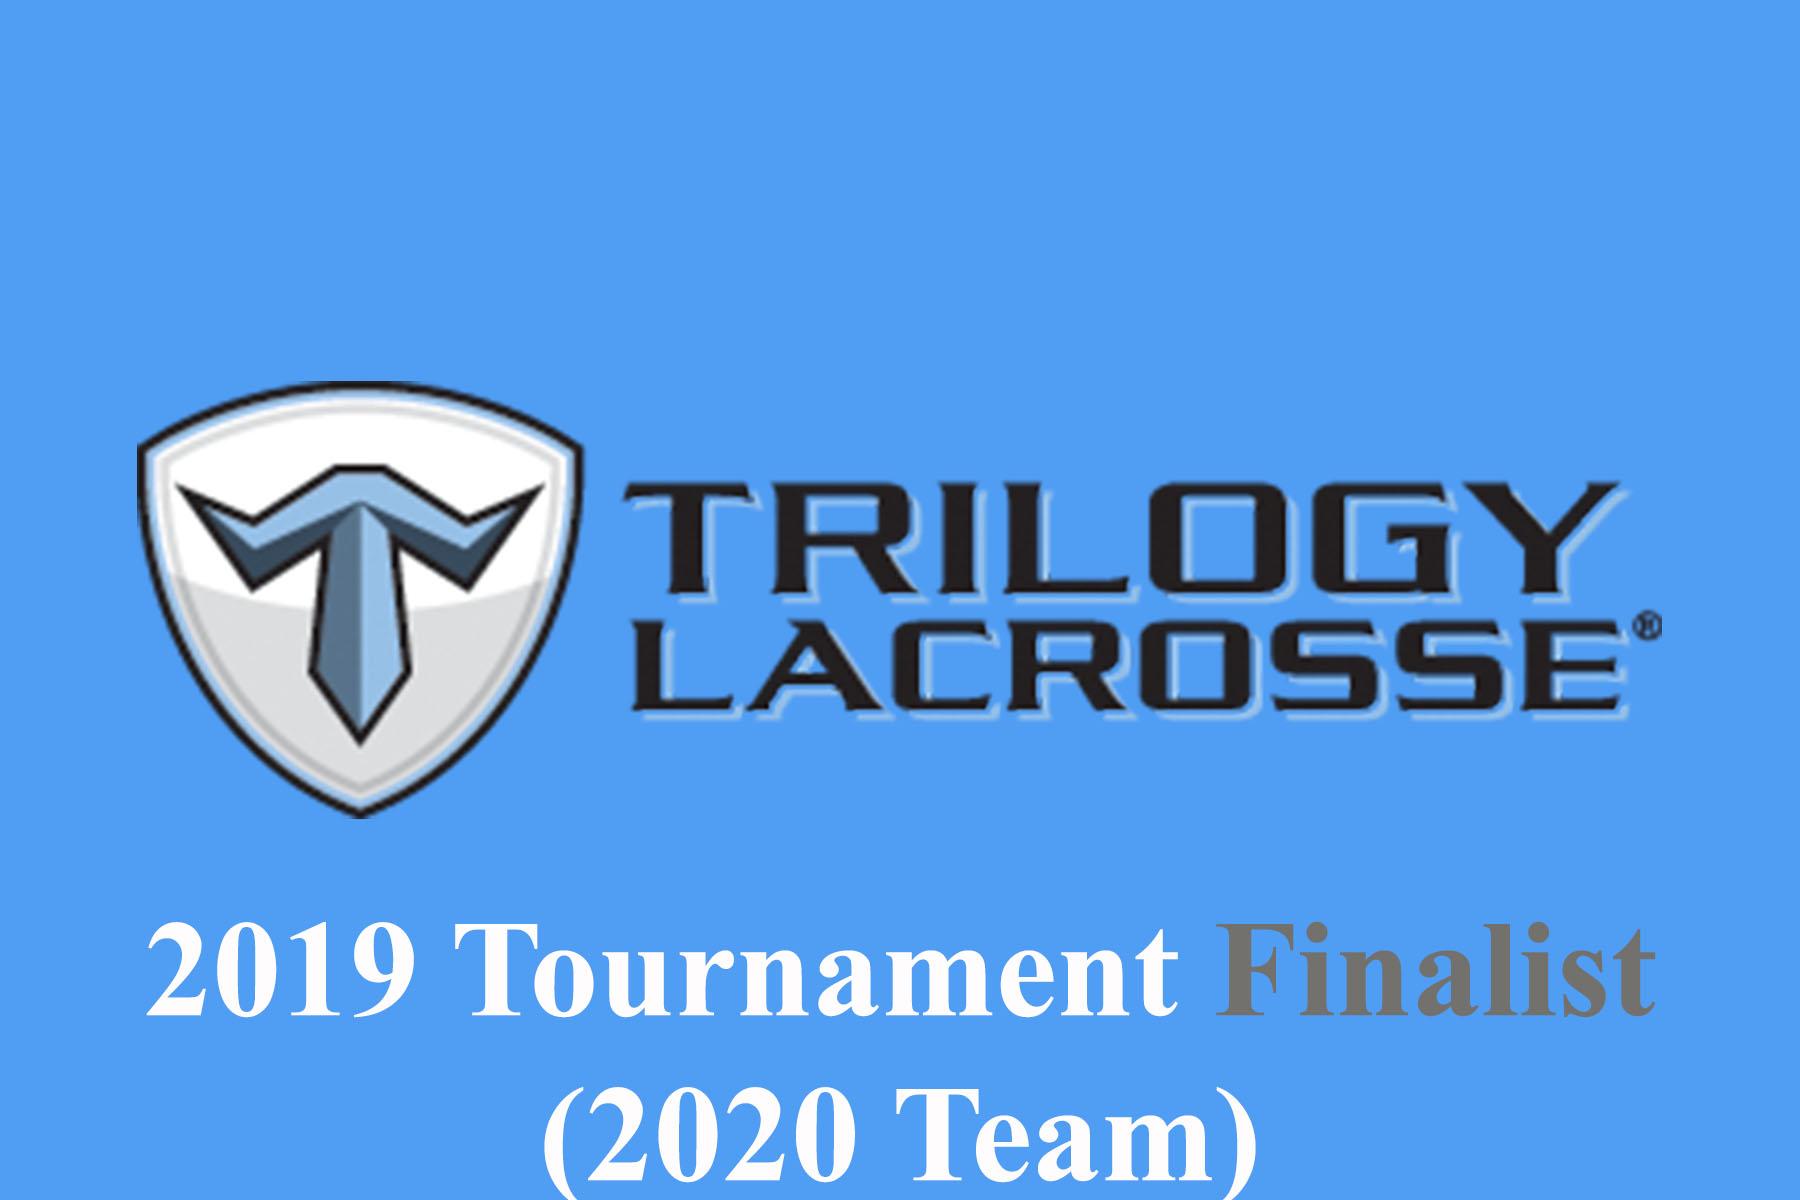 Trilogy 24 2019 Finalist 2020